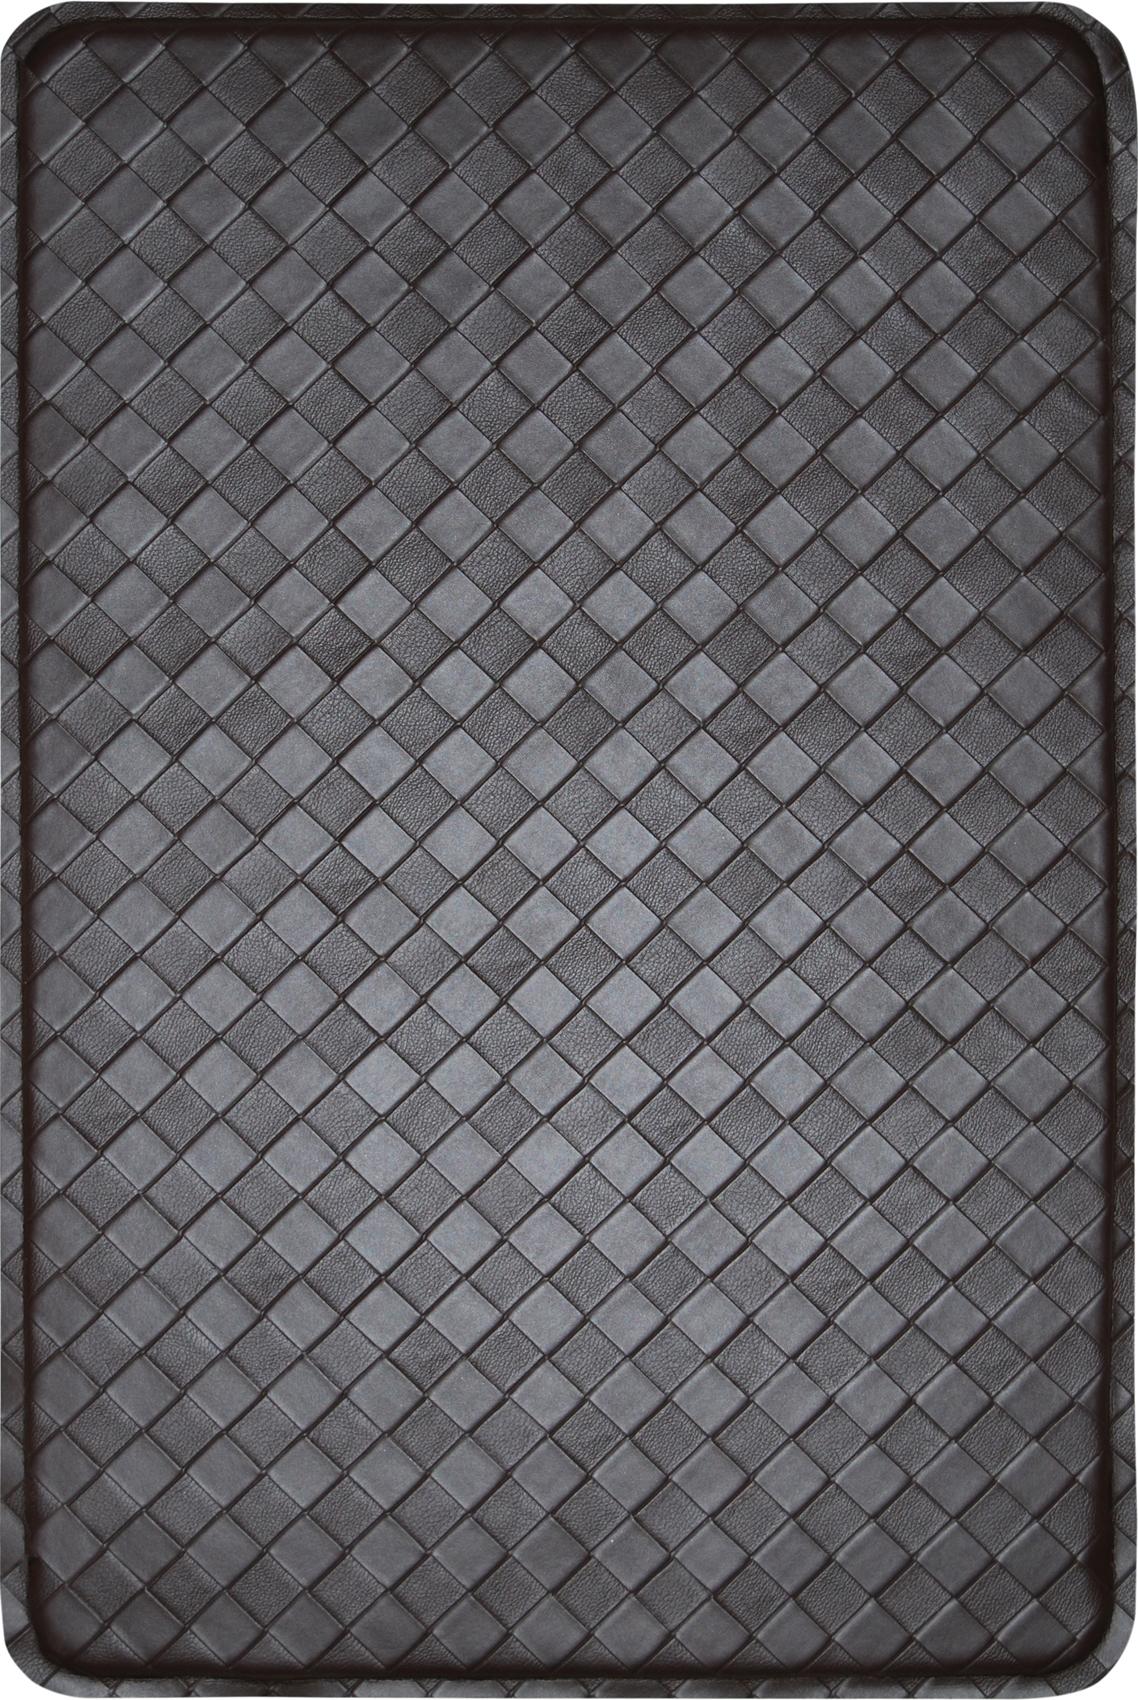 kitchen floor mats Modern Indoor Cushion Kitchen Rug Anti Fatigue Floor